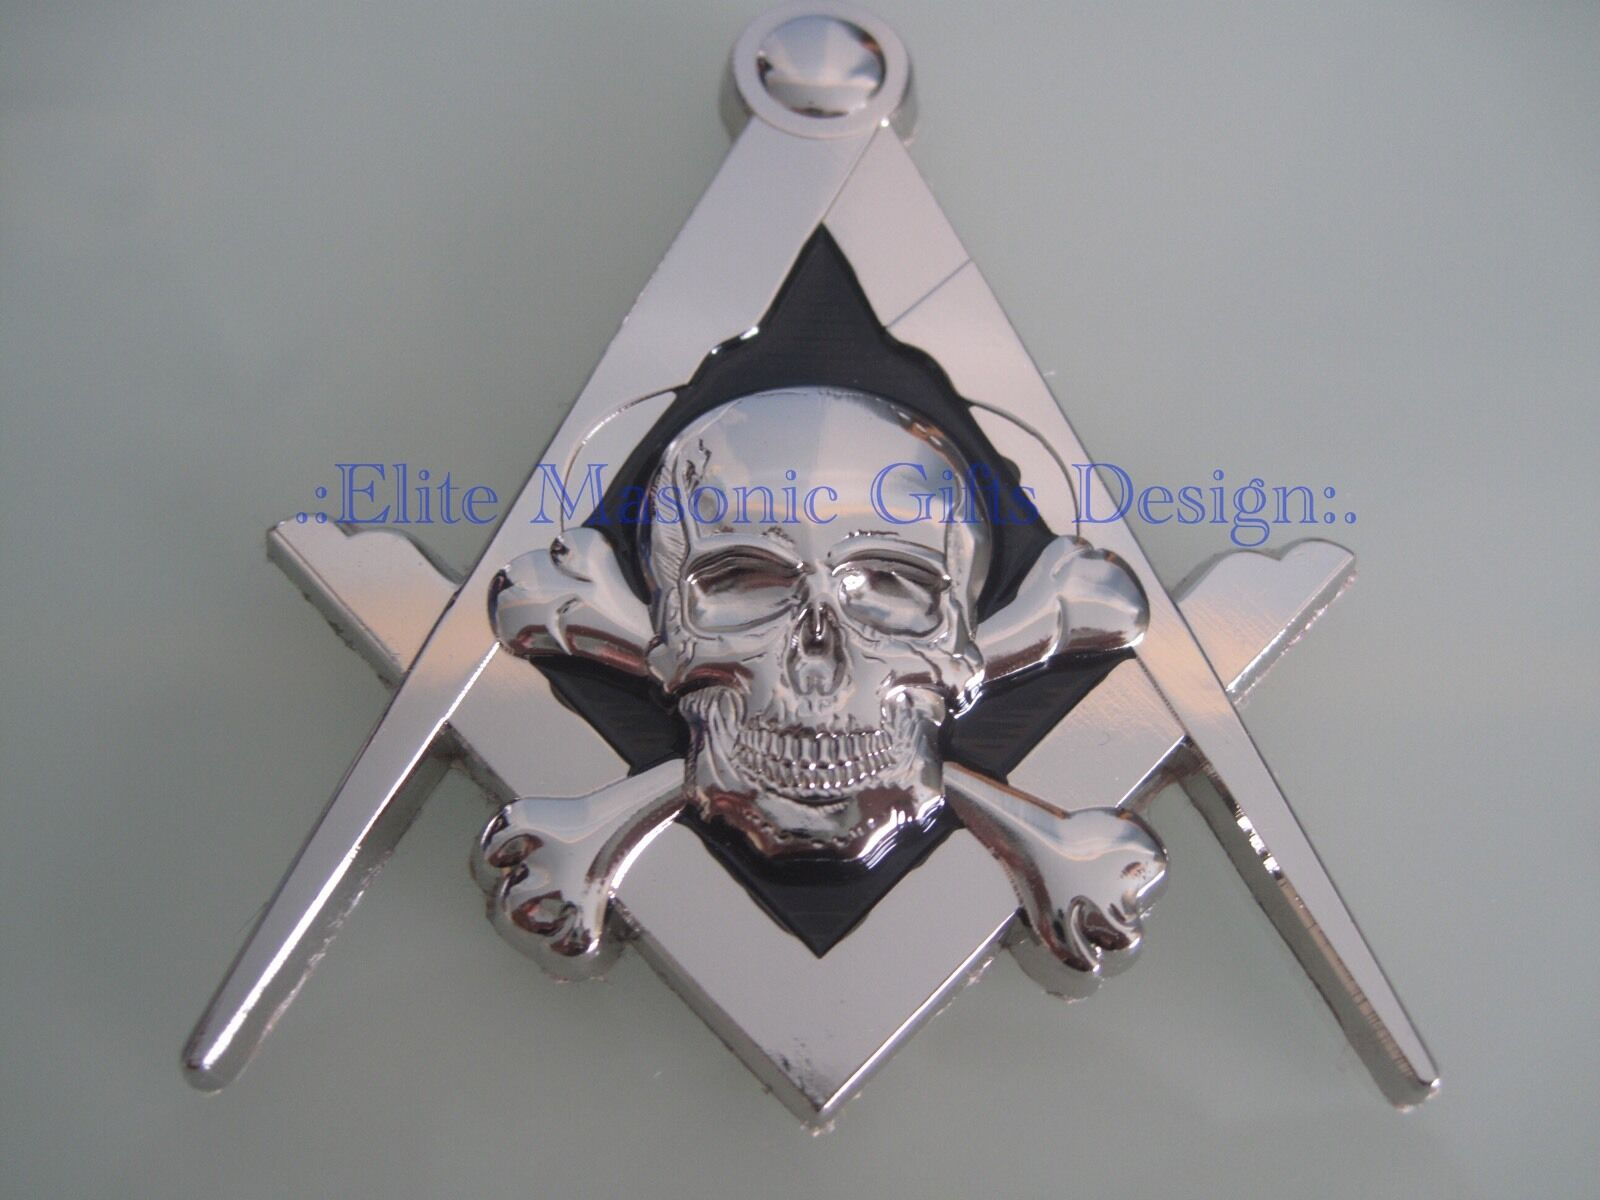 New3D Masonic Master Mason Skull Car Emblem, [Silver] EliteMasonicGiftsDesign...